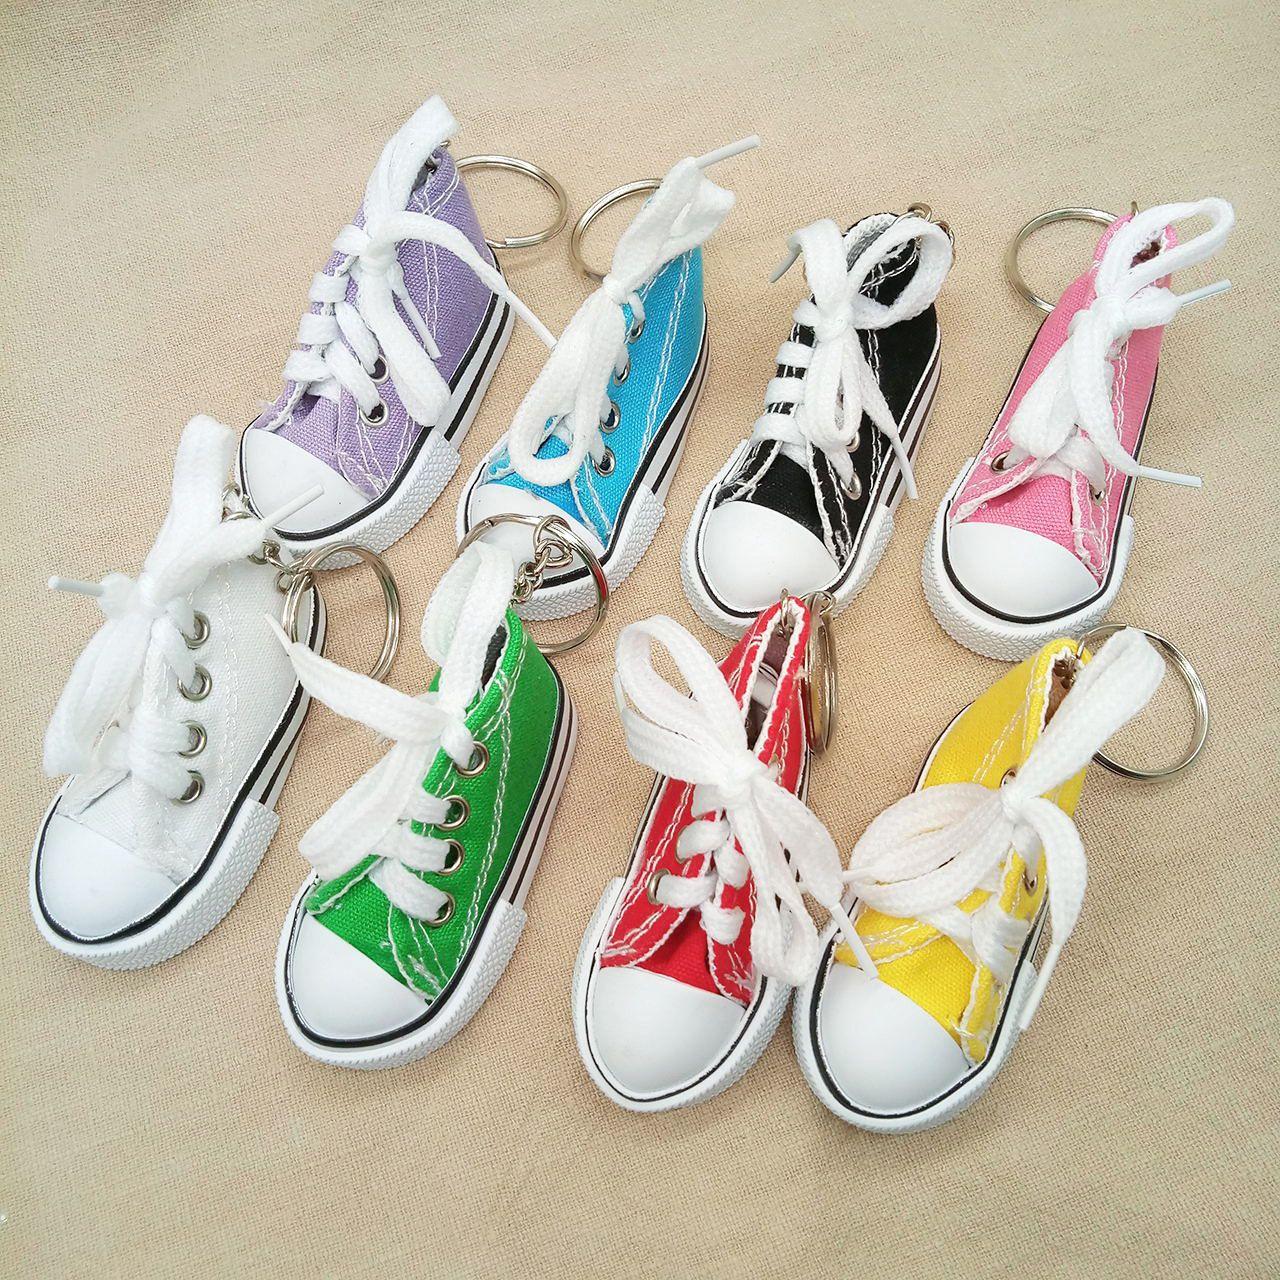 3D Novelty Canvas Sneaker Tennis Shoe Keychain Key Chain Party Jewelry 100pcs random colors send YYA1069